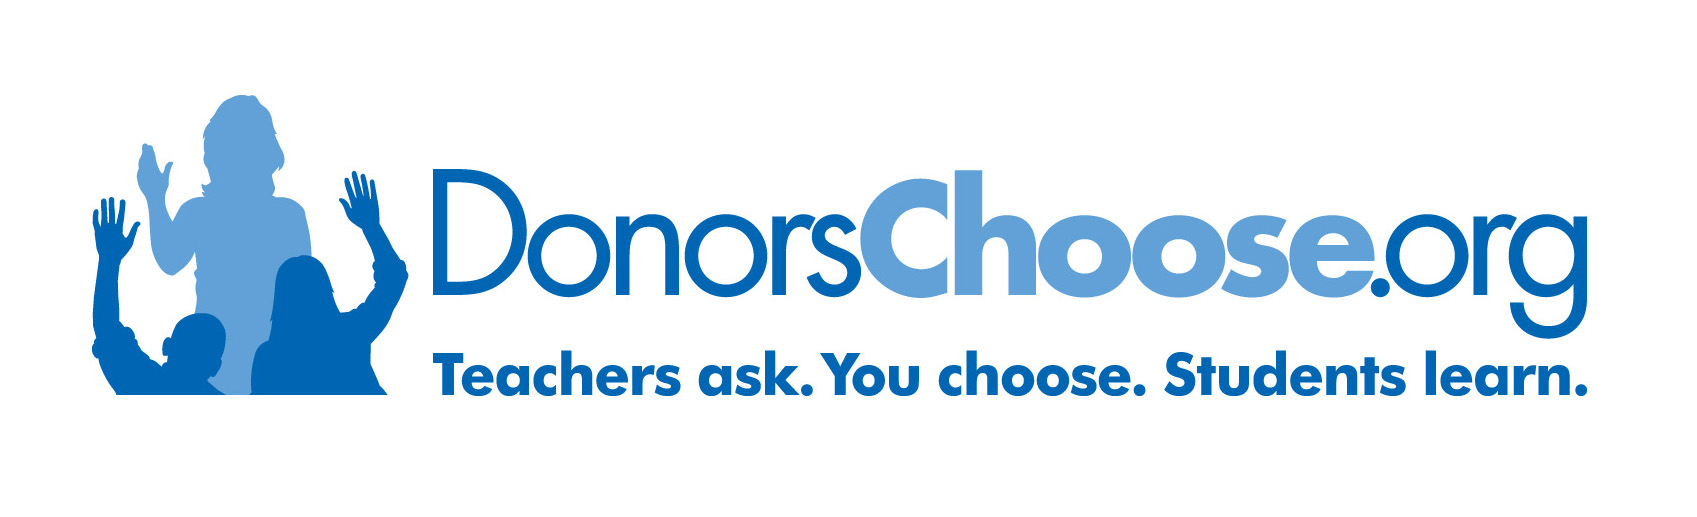 DonorsChoose_org_logo.jpg